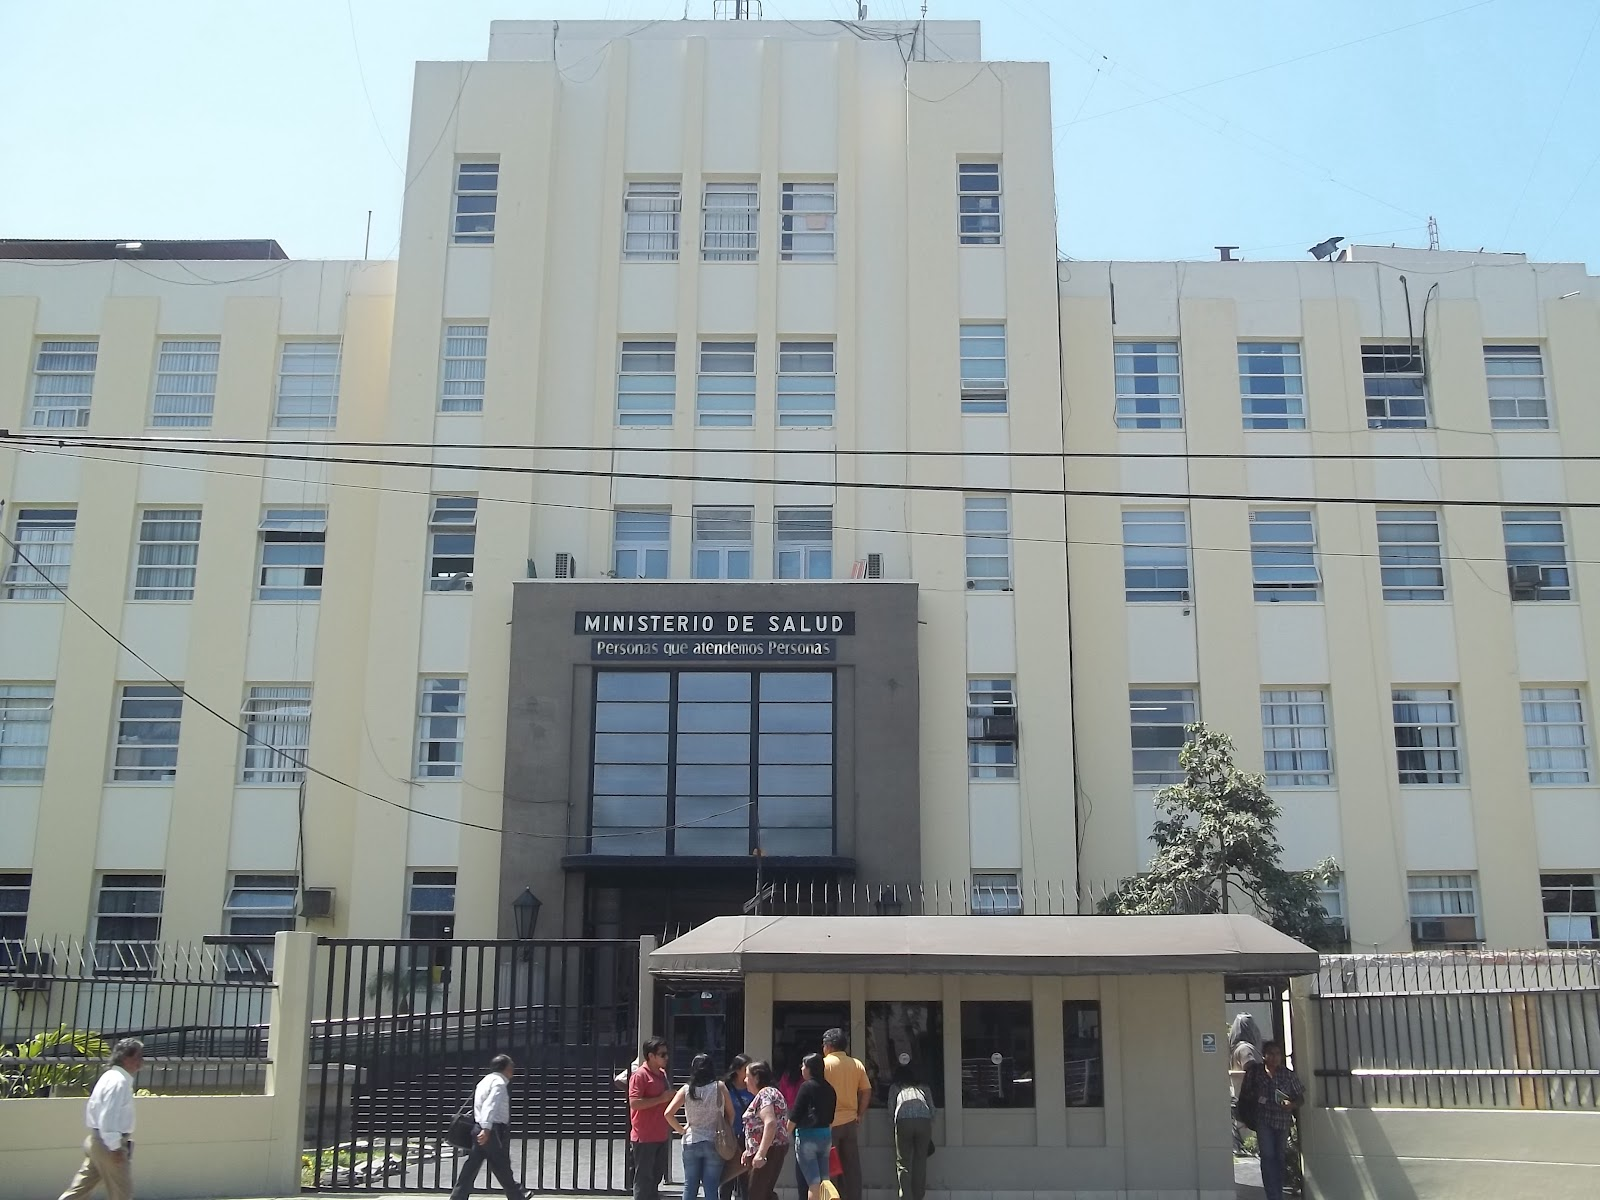 Arquitectura contemporanea de lima 4854 ministerio de salud for Sueldos del ministerio del interior